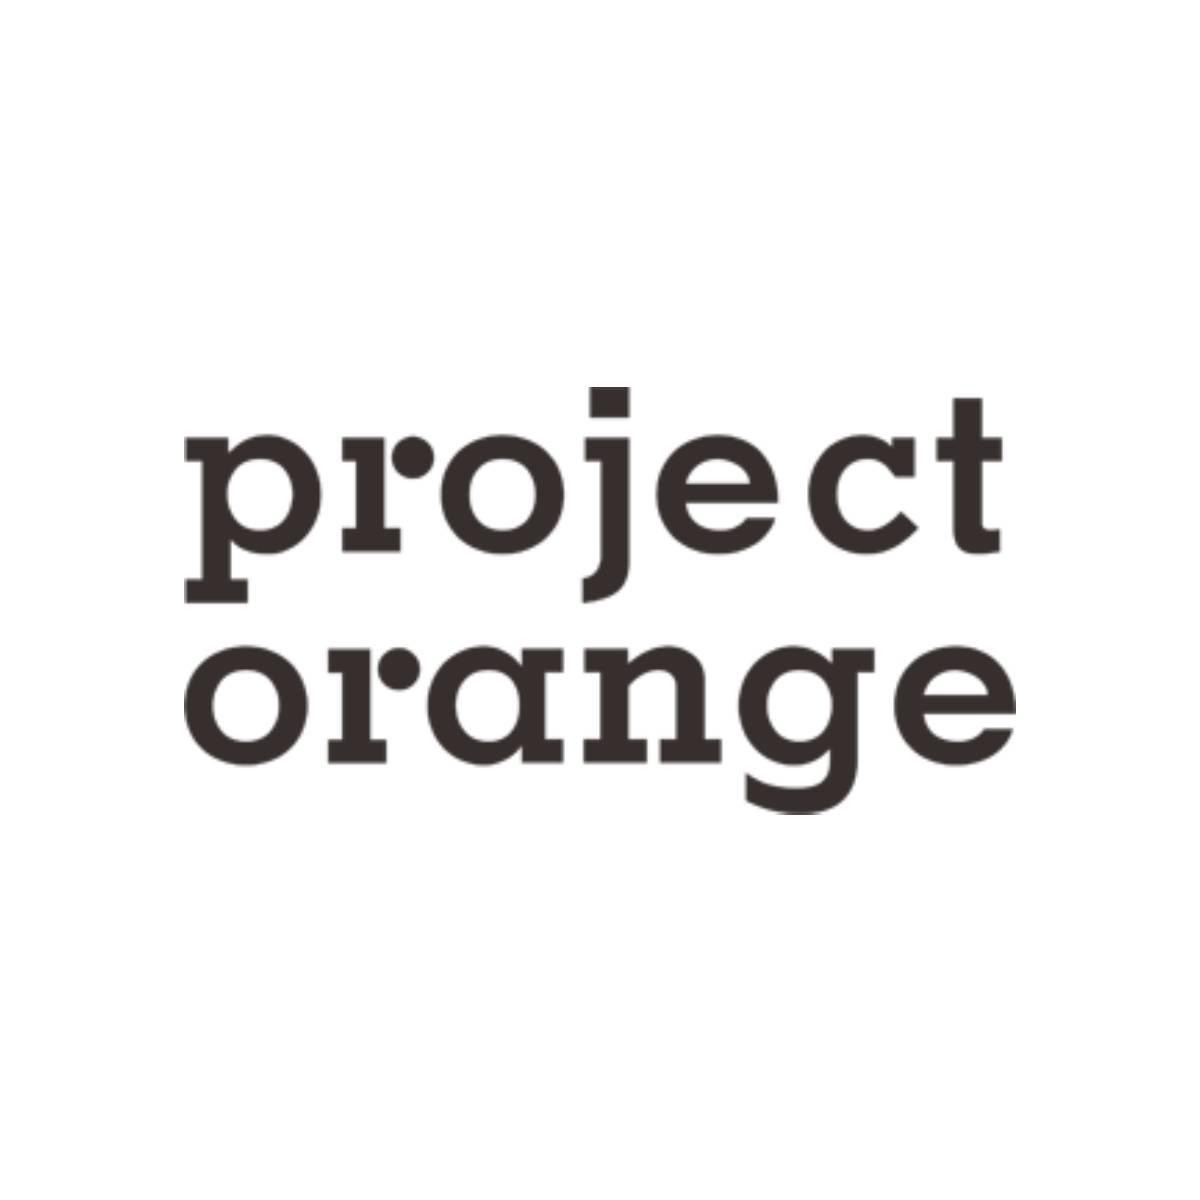 Projectorange.jpg